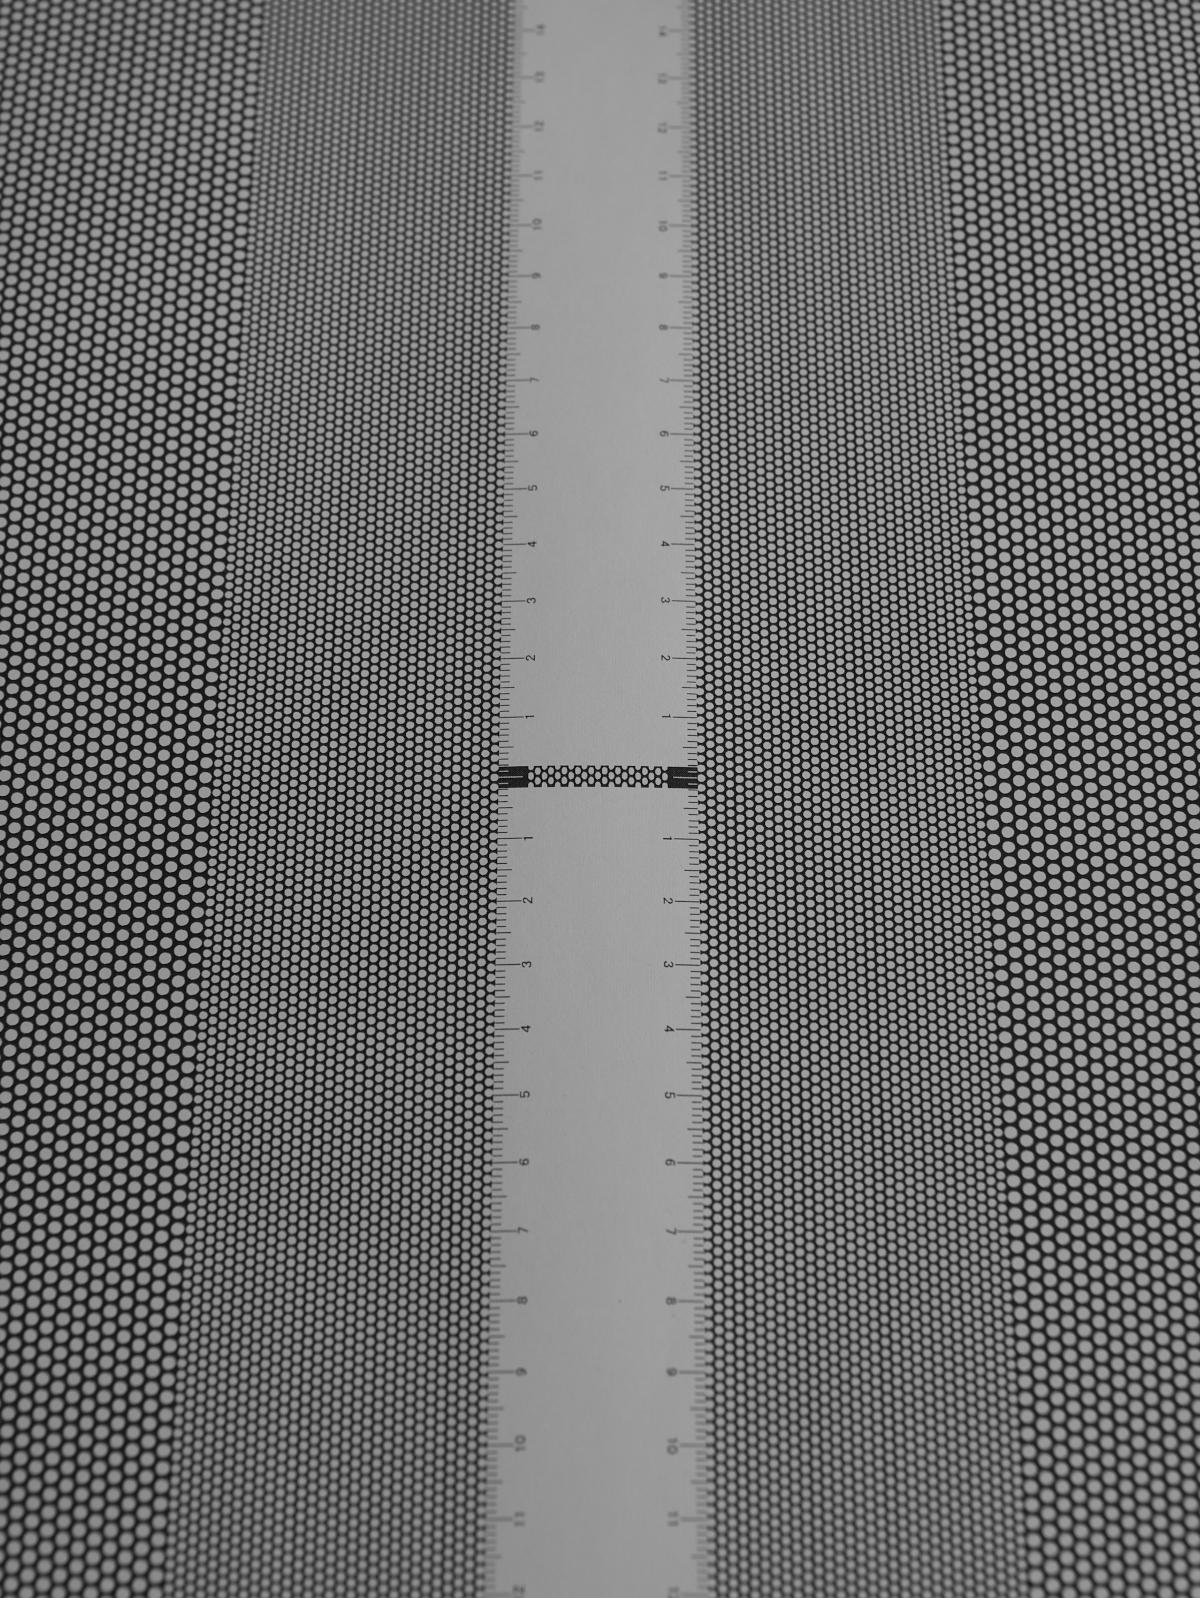 Flektogon 35mm F2.8 (前期型・シルバー) レンズ性能_b0161171_1418314.jpg